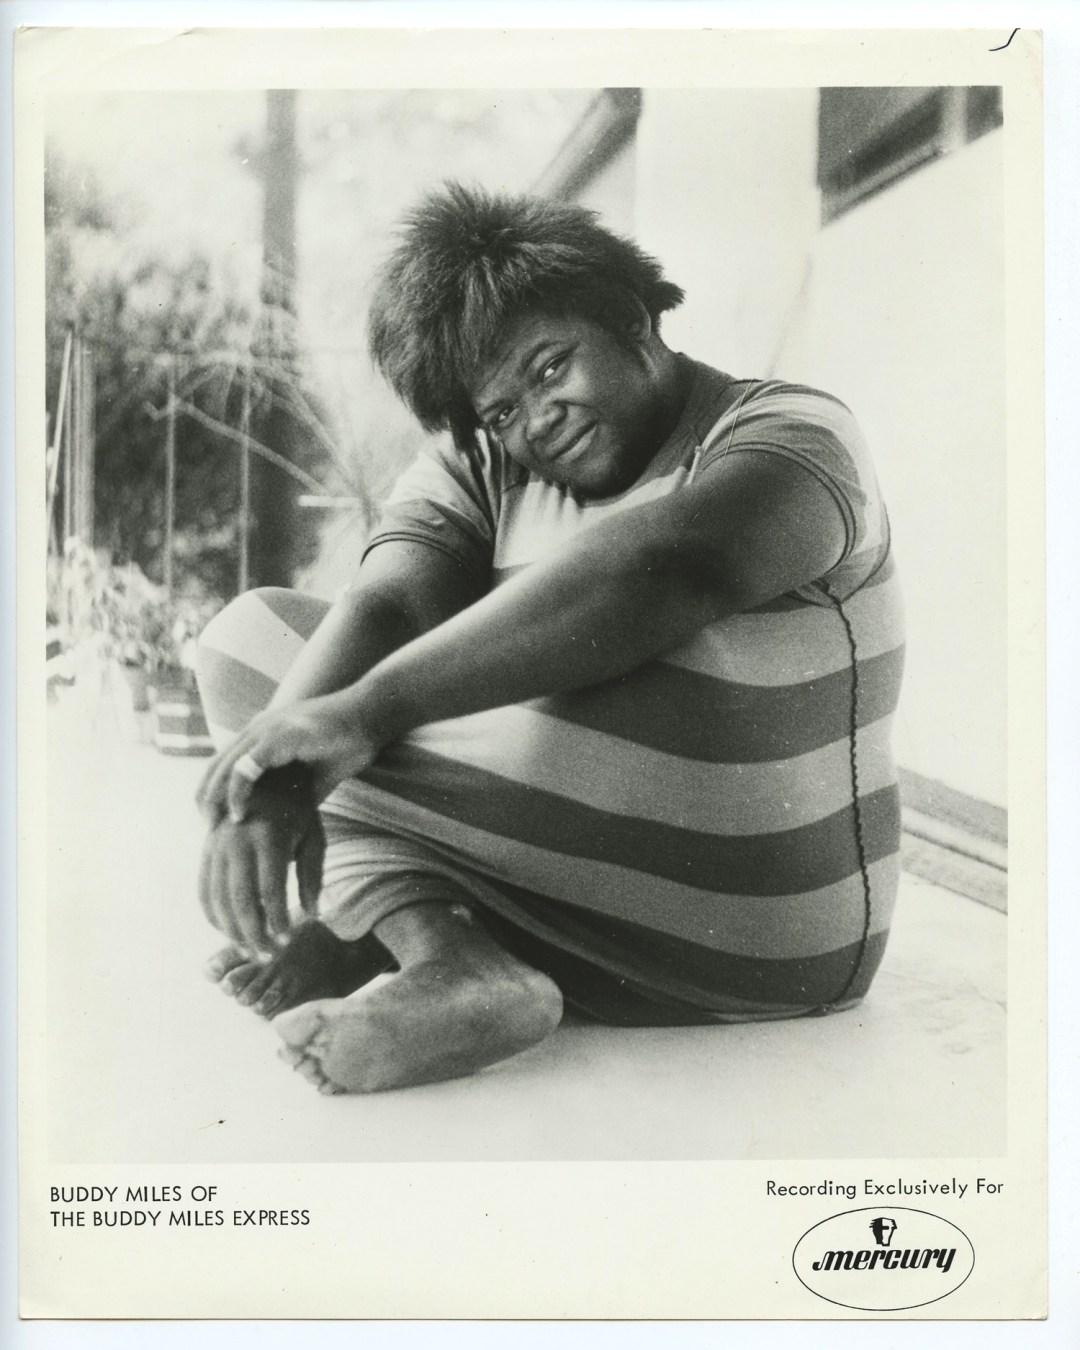 Buddy Miles Photo Mercury Records Original Vintage